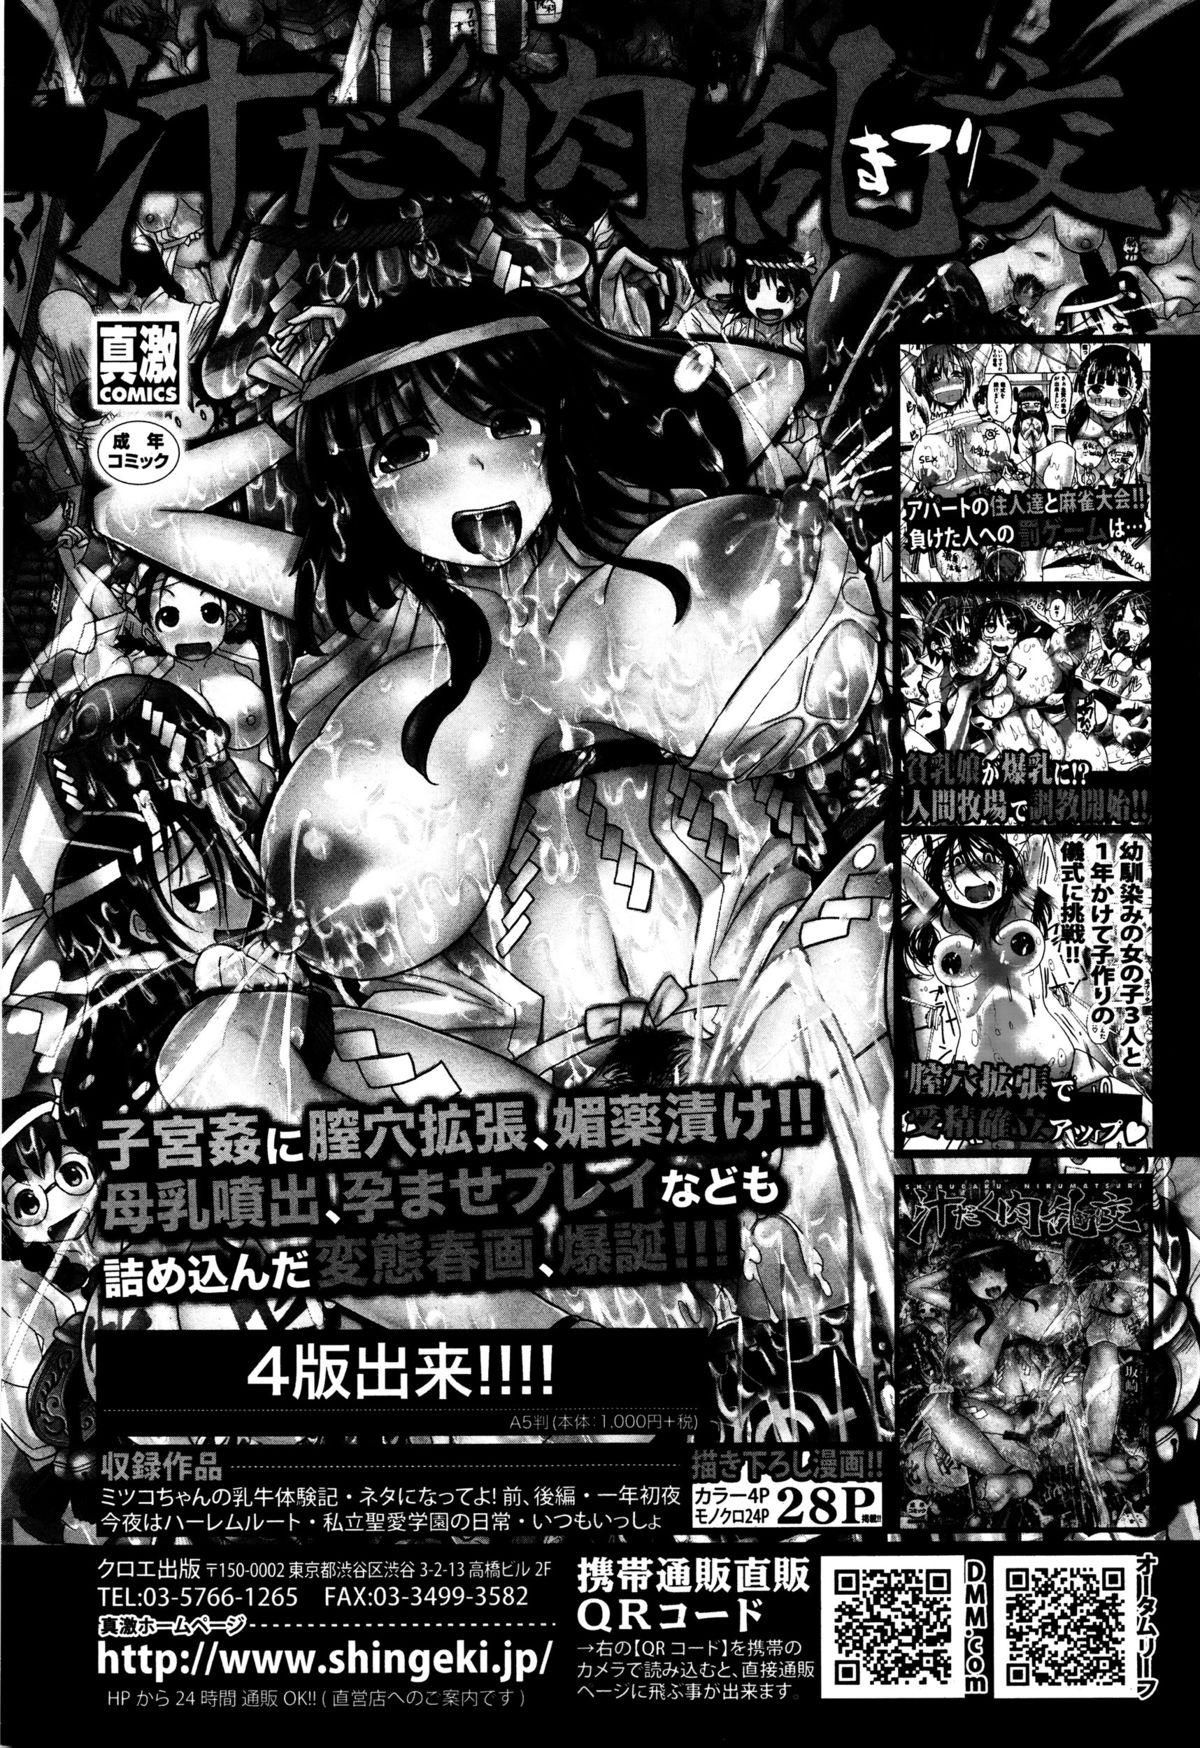 COMIC Shingeki 2016-01 220